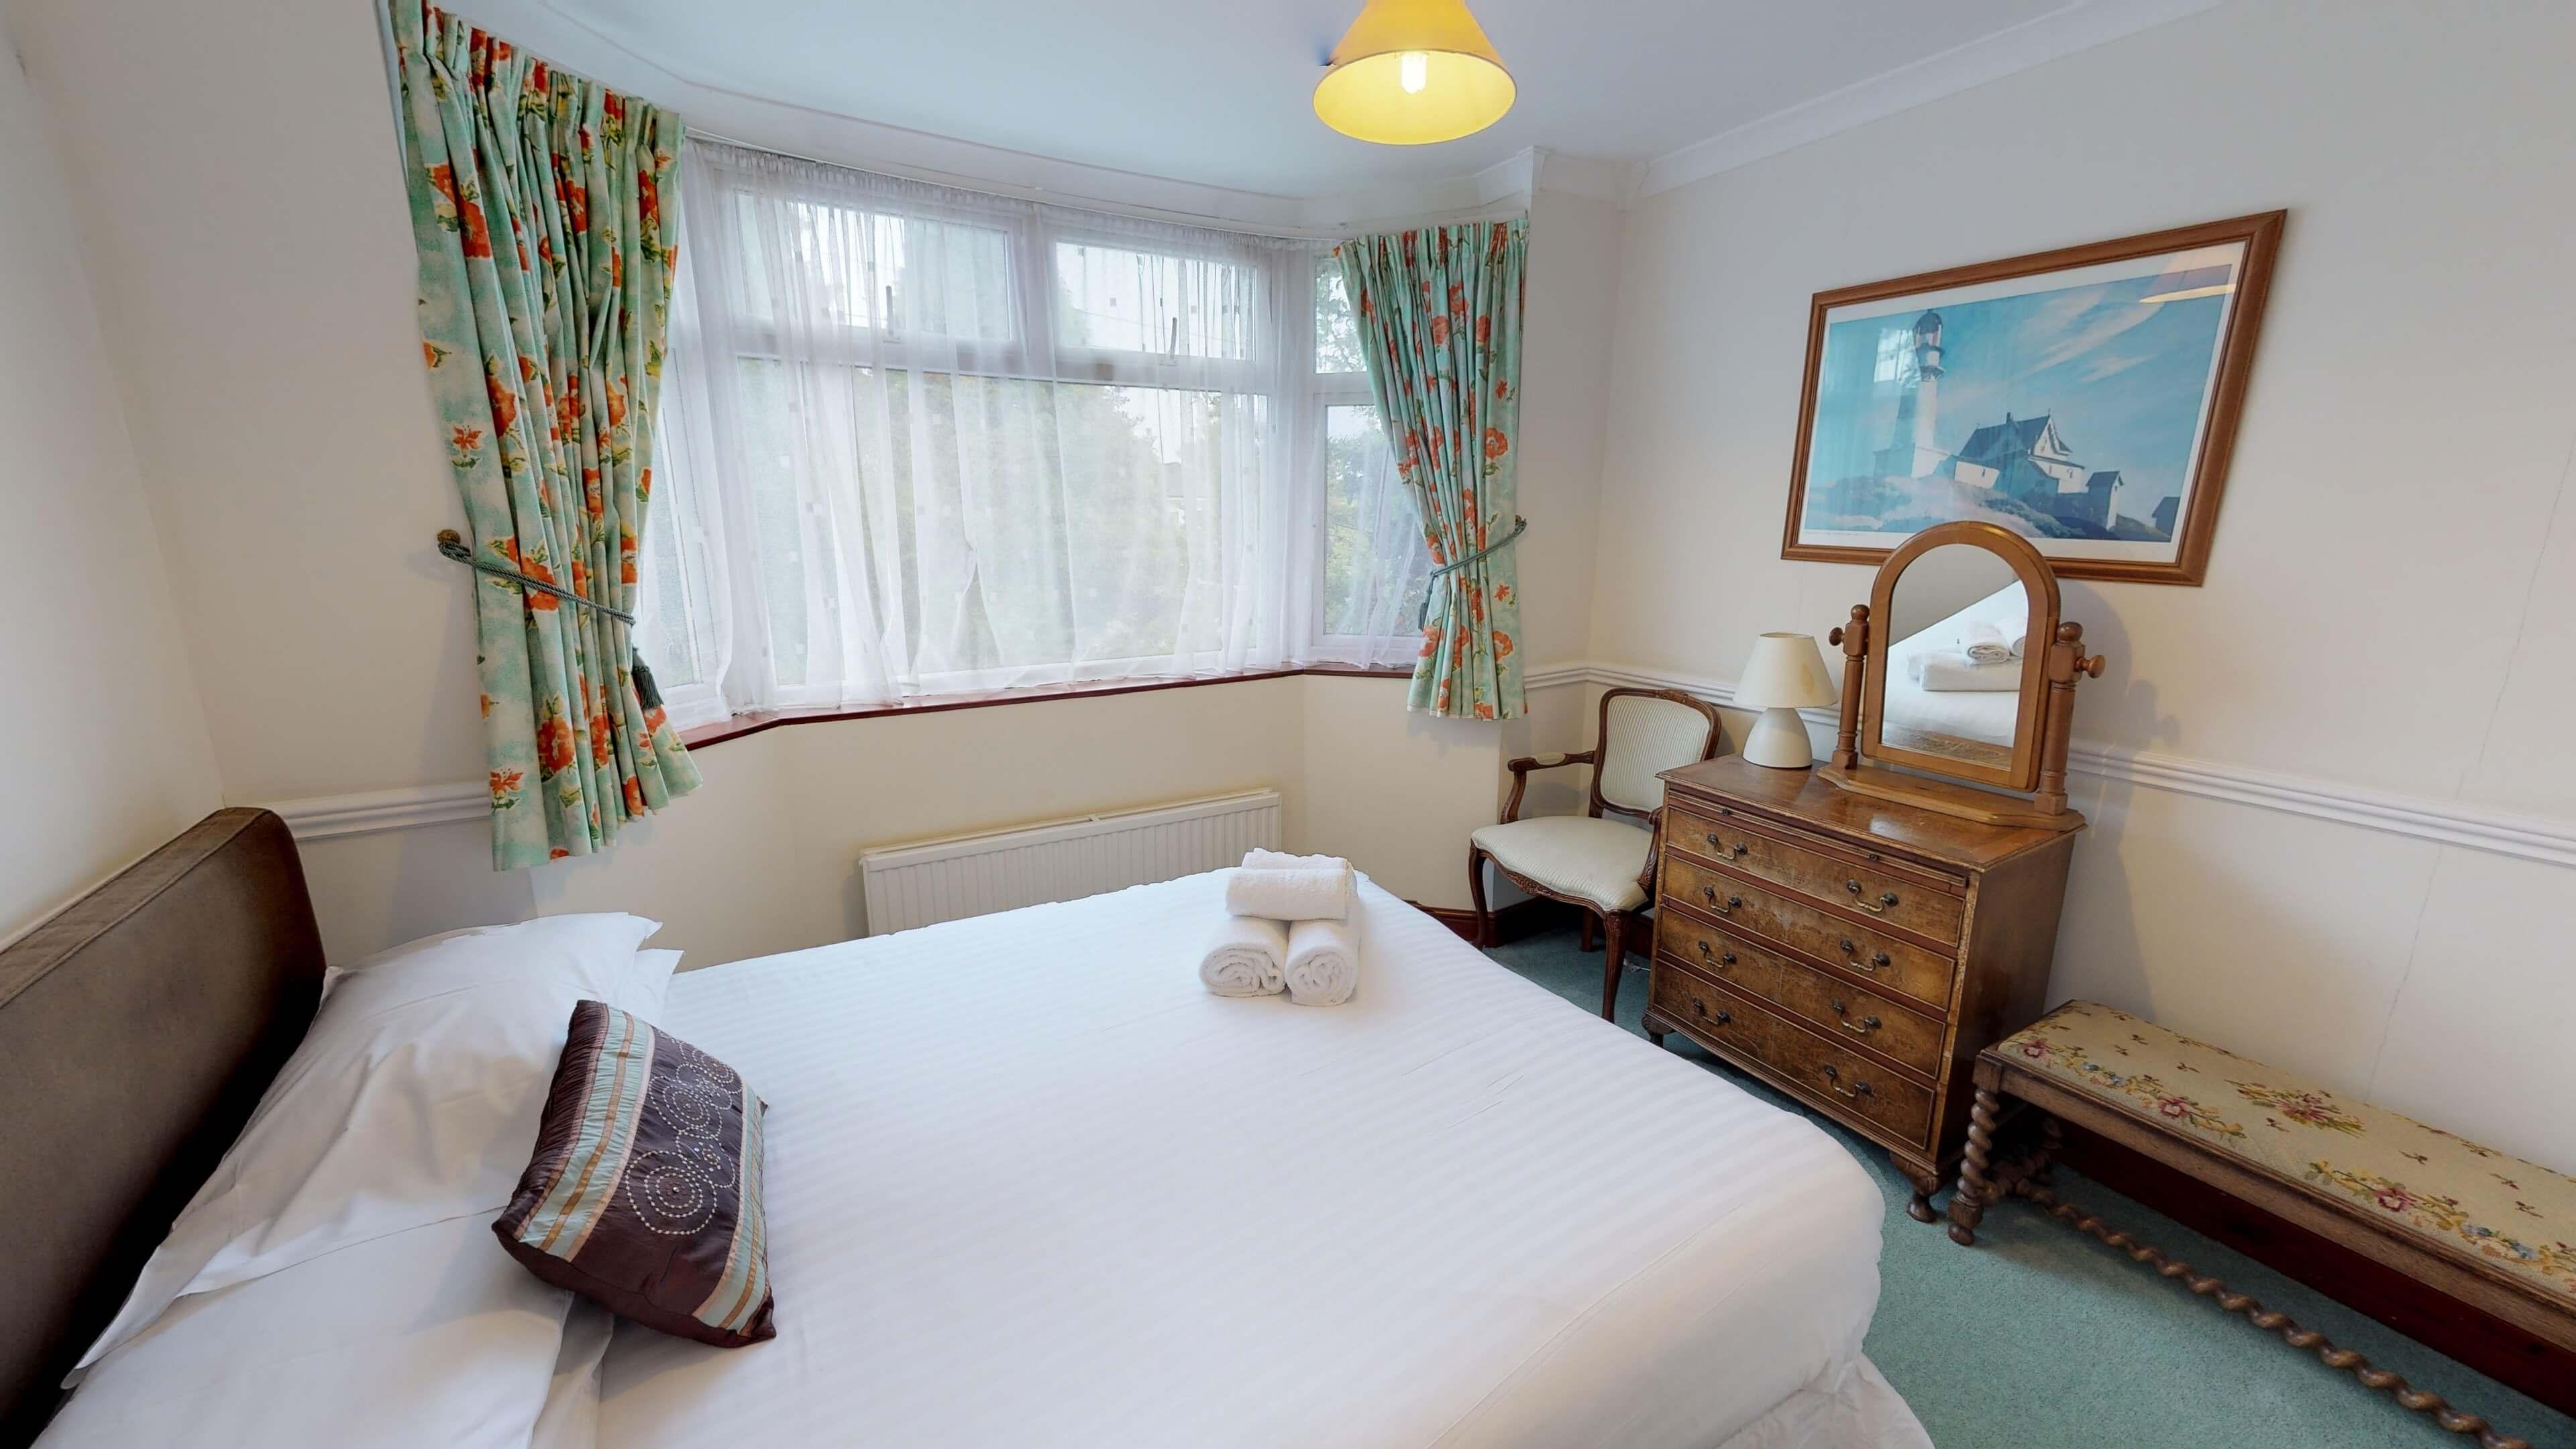 Lashford Lane Bedroom1